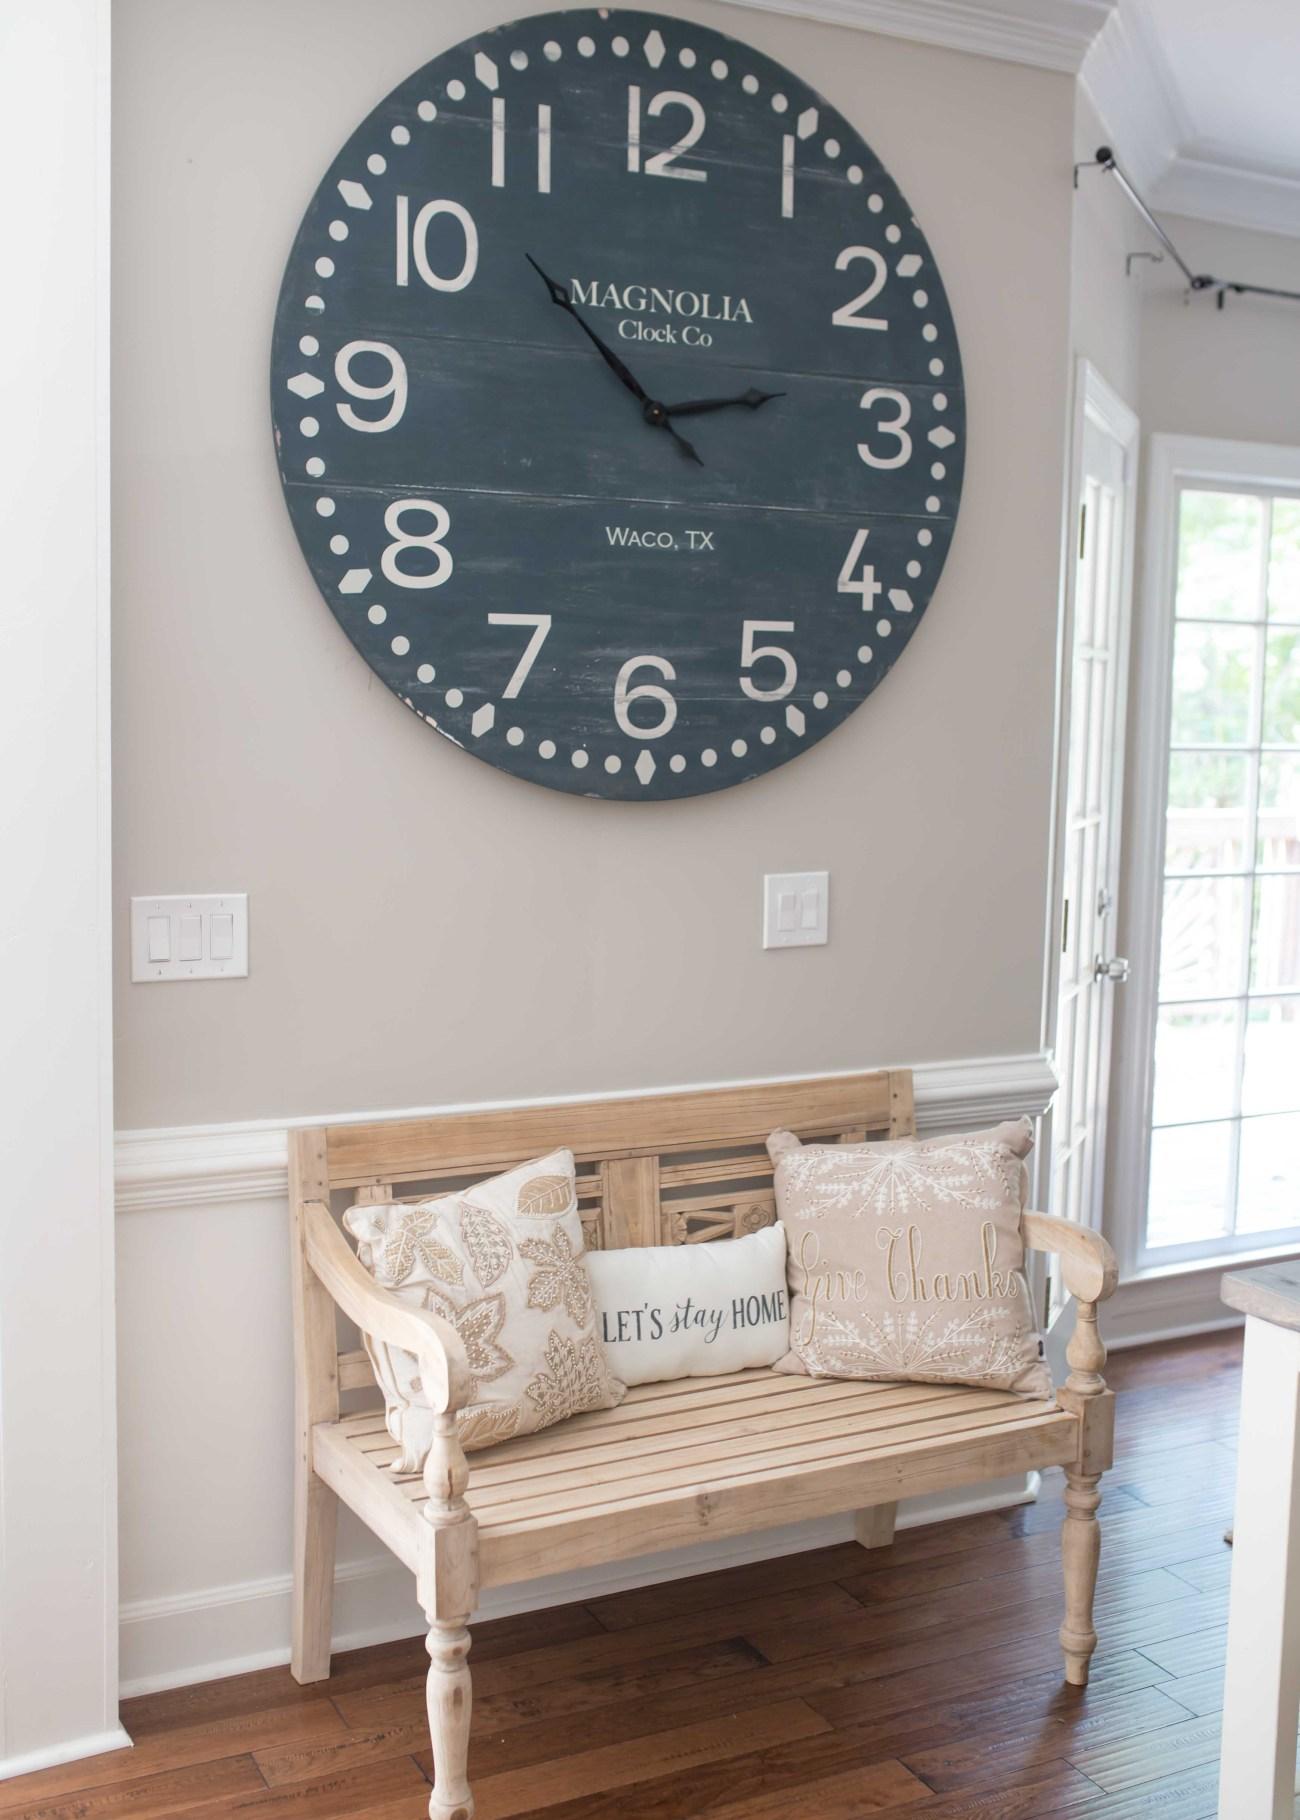 home entry bench Magnolia clock